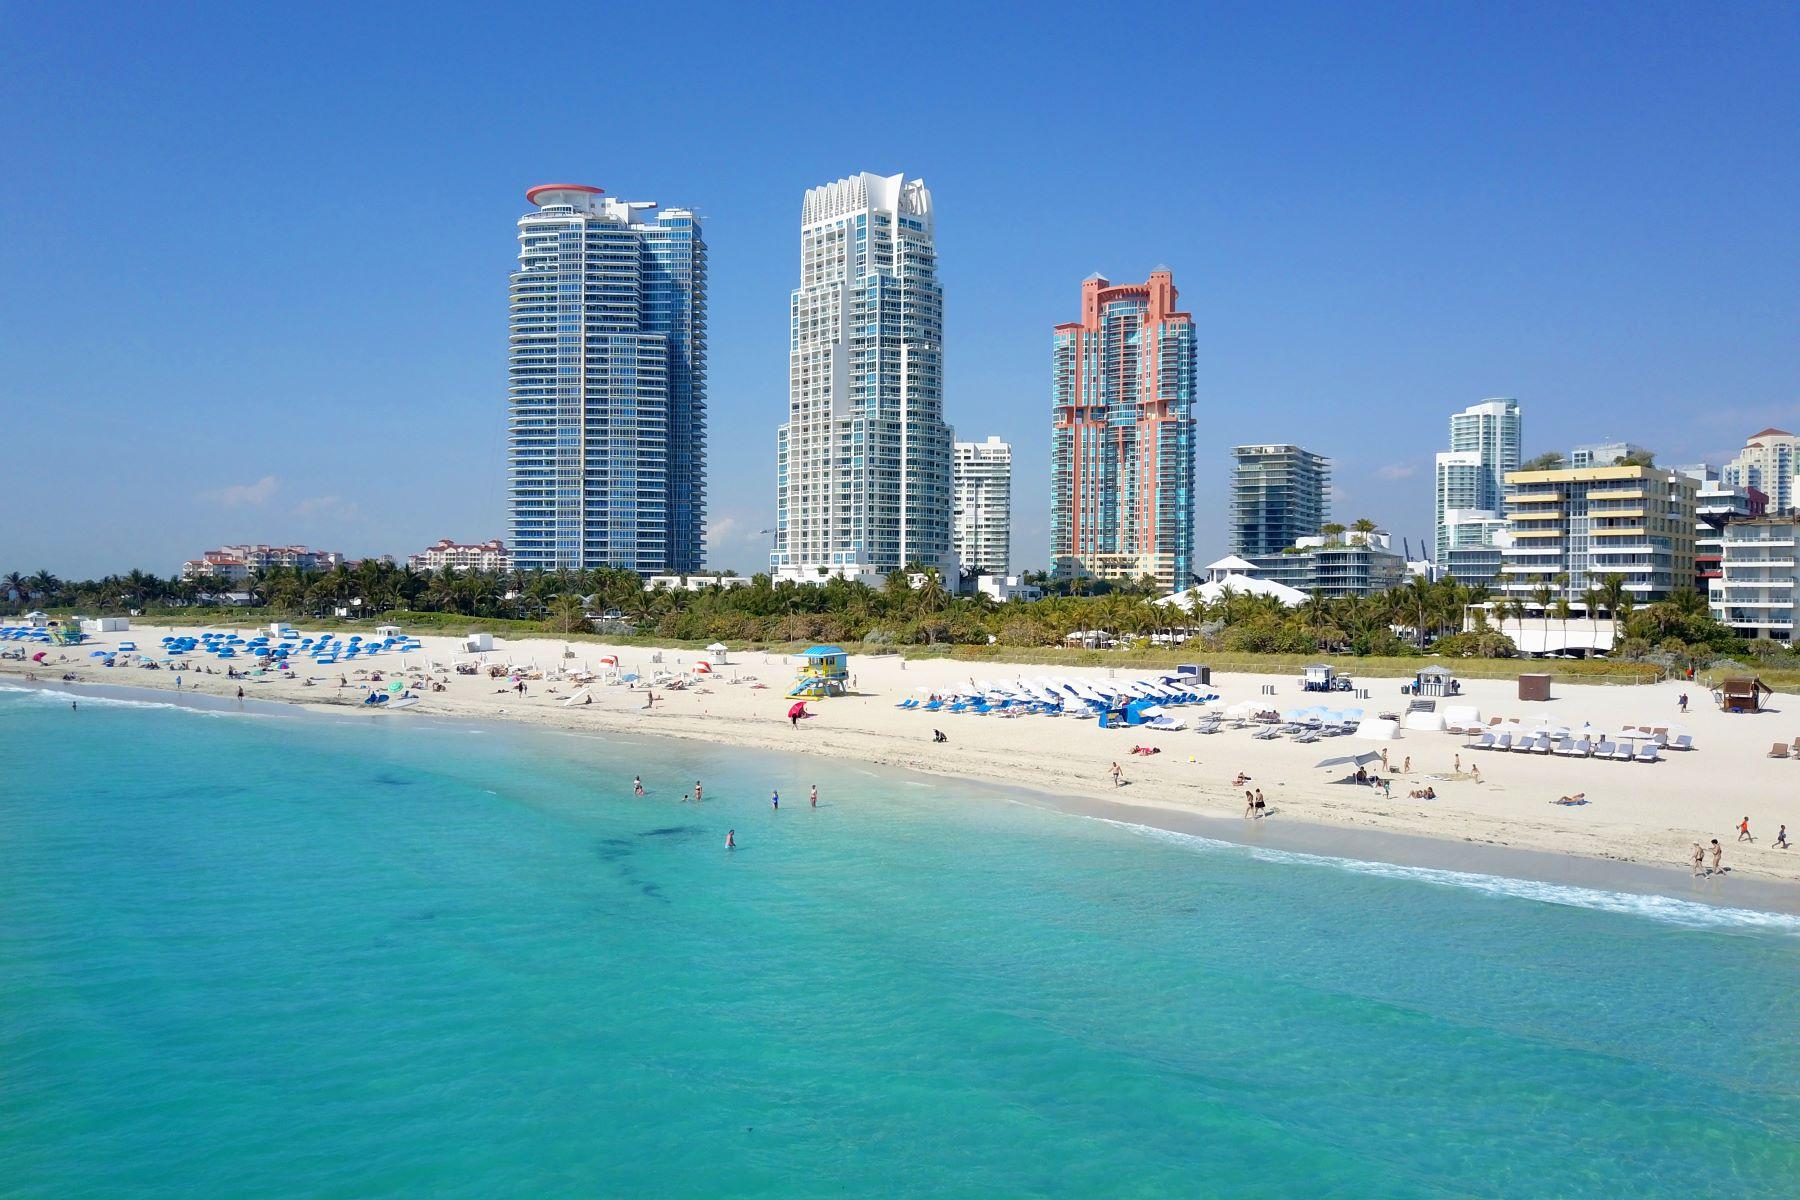 Nhà chung cư vì Bán tại 100 S Pointe Dr #1404 100 SPointe Dr 1404 Miami Beach, Florida, 33139 Hoa Kỳ